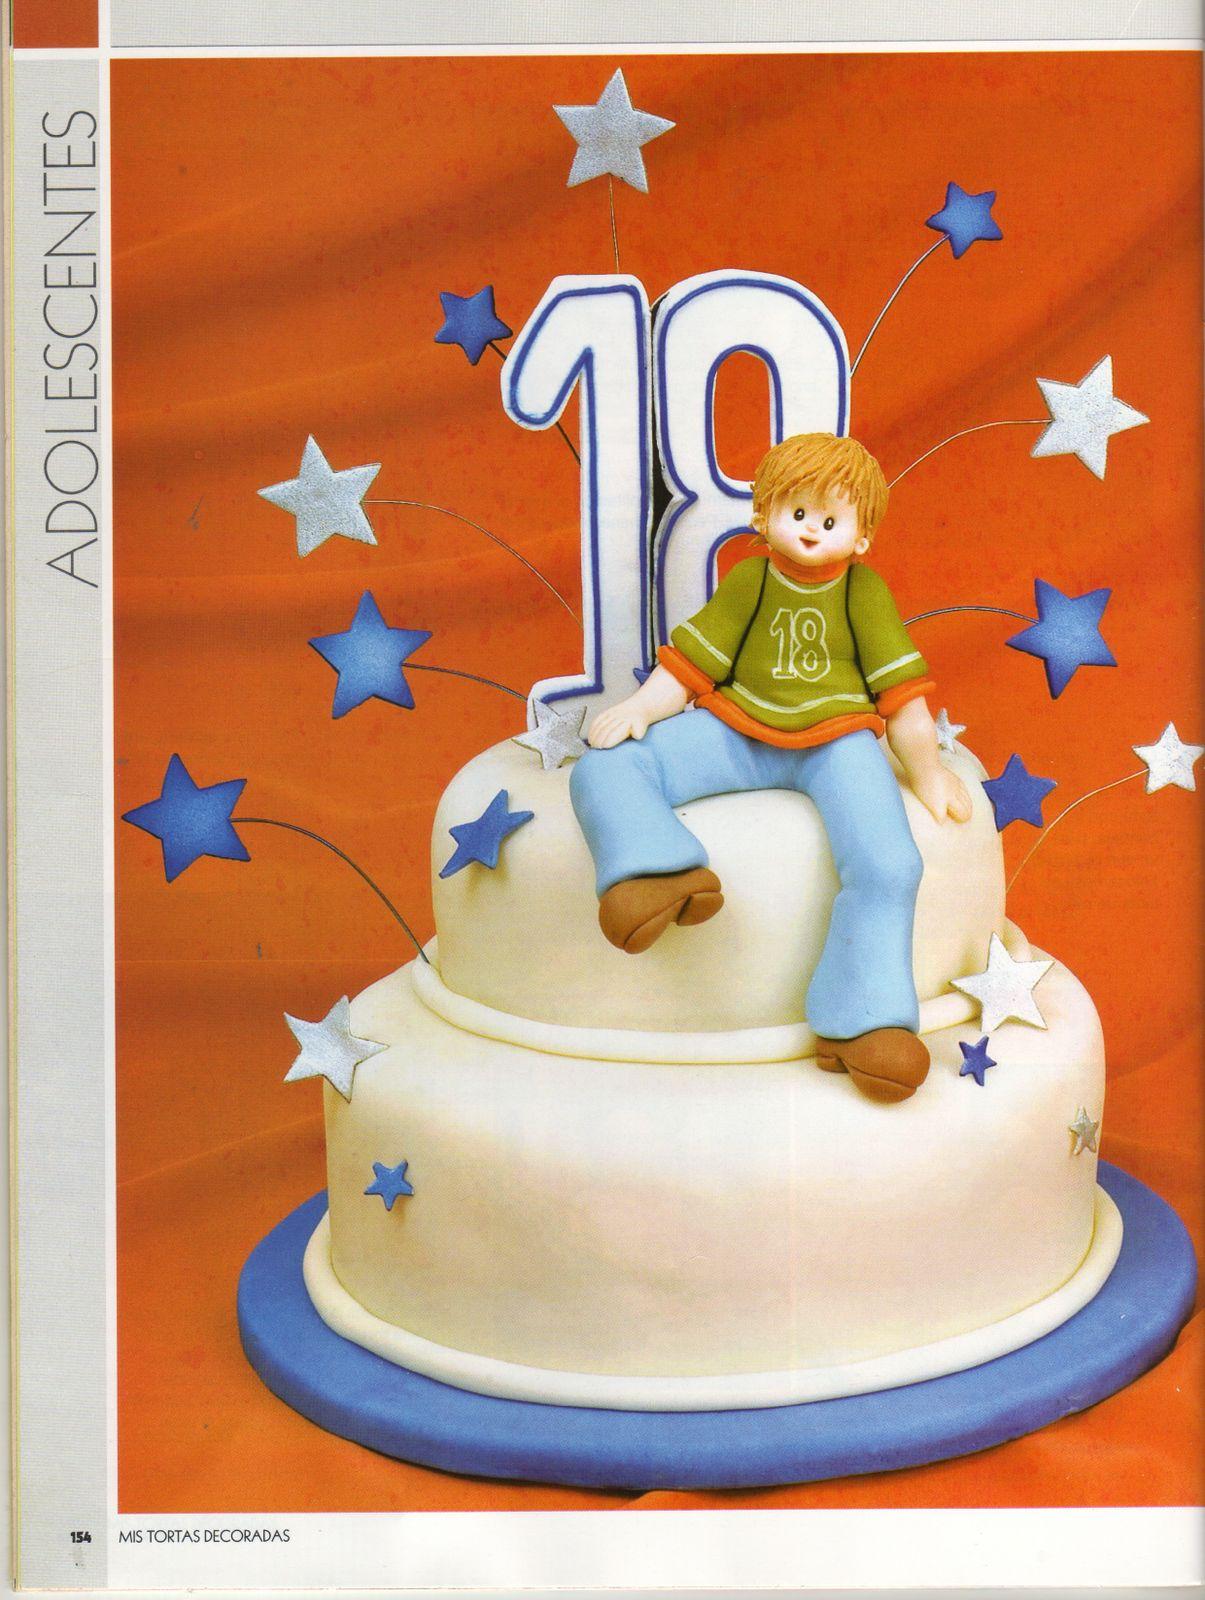 Decoraci n de tortas tortas infantiles para bodas - Bizcochos cumpleanos infantiles ...